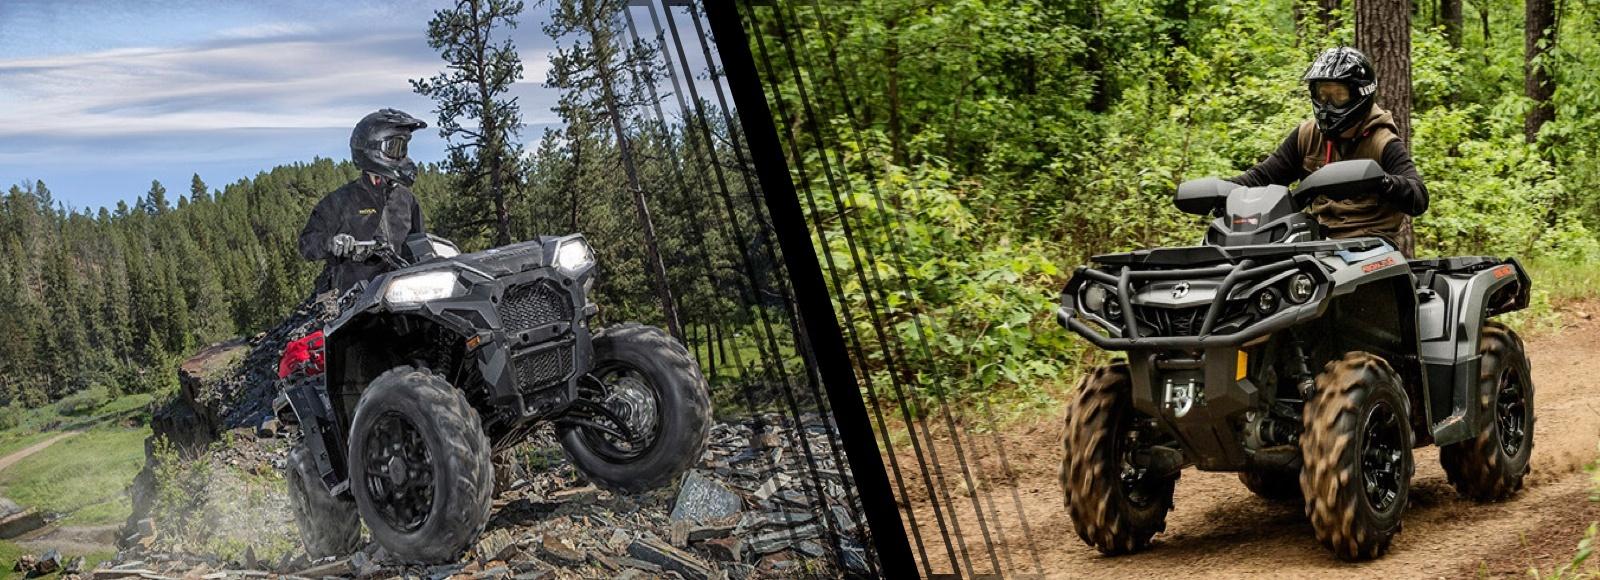 ATV Review : Polaris Sportsman 850 vs CanAm Outlander DPS 850